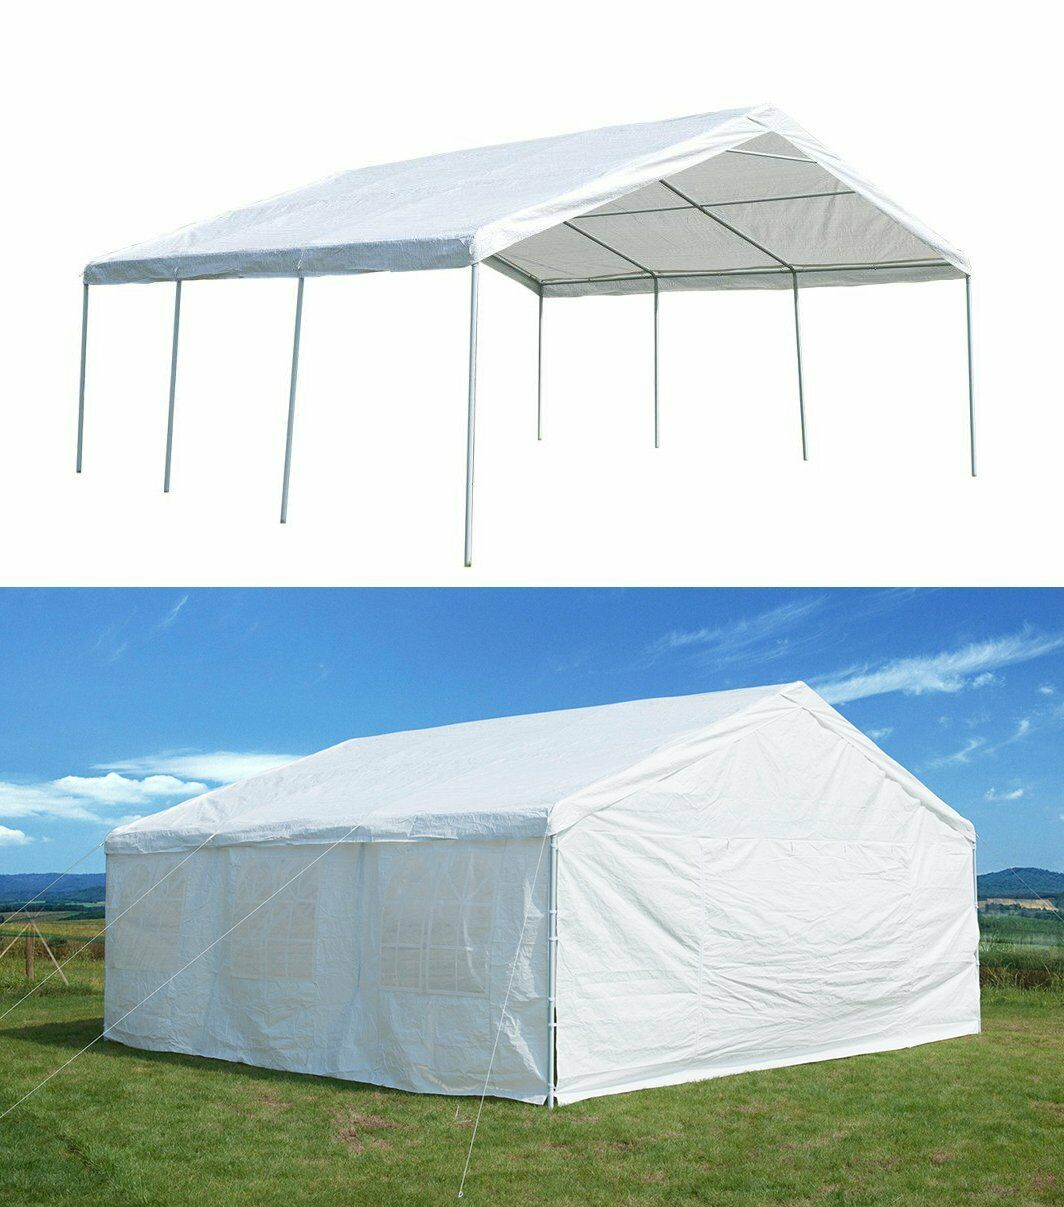 Canopy Tent 20x20 Carport Heavy Duty Outdoor Wedding Canopy